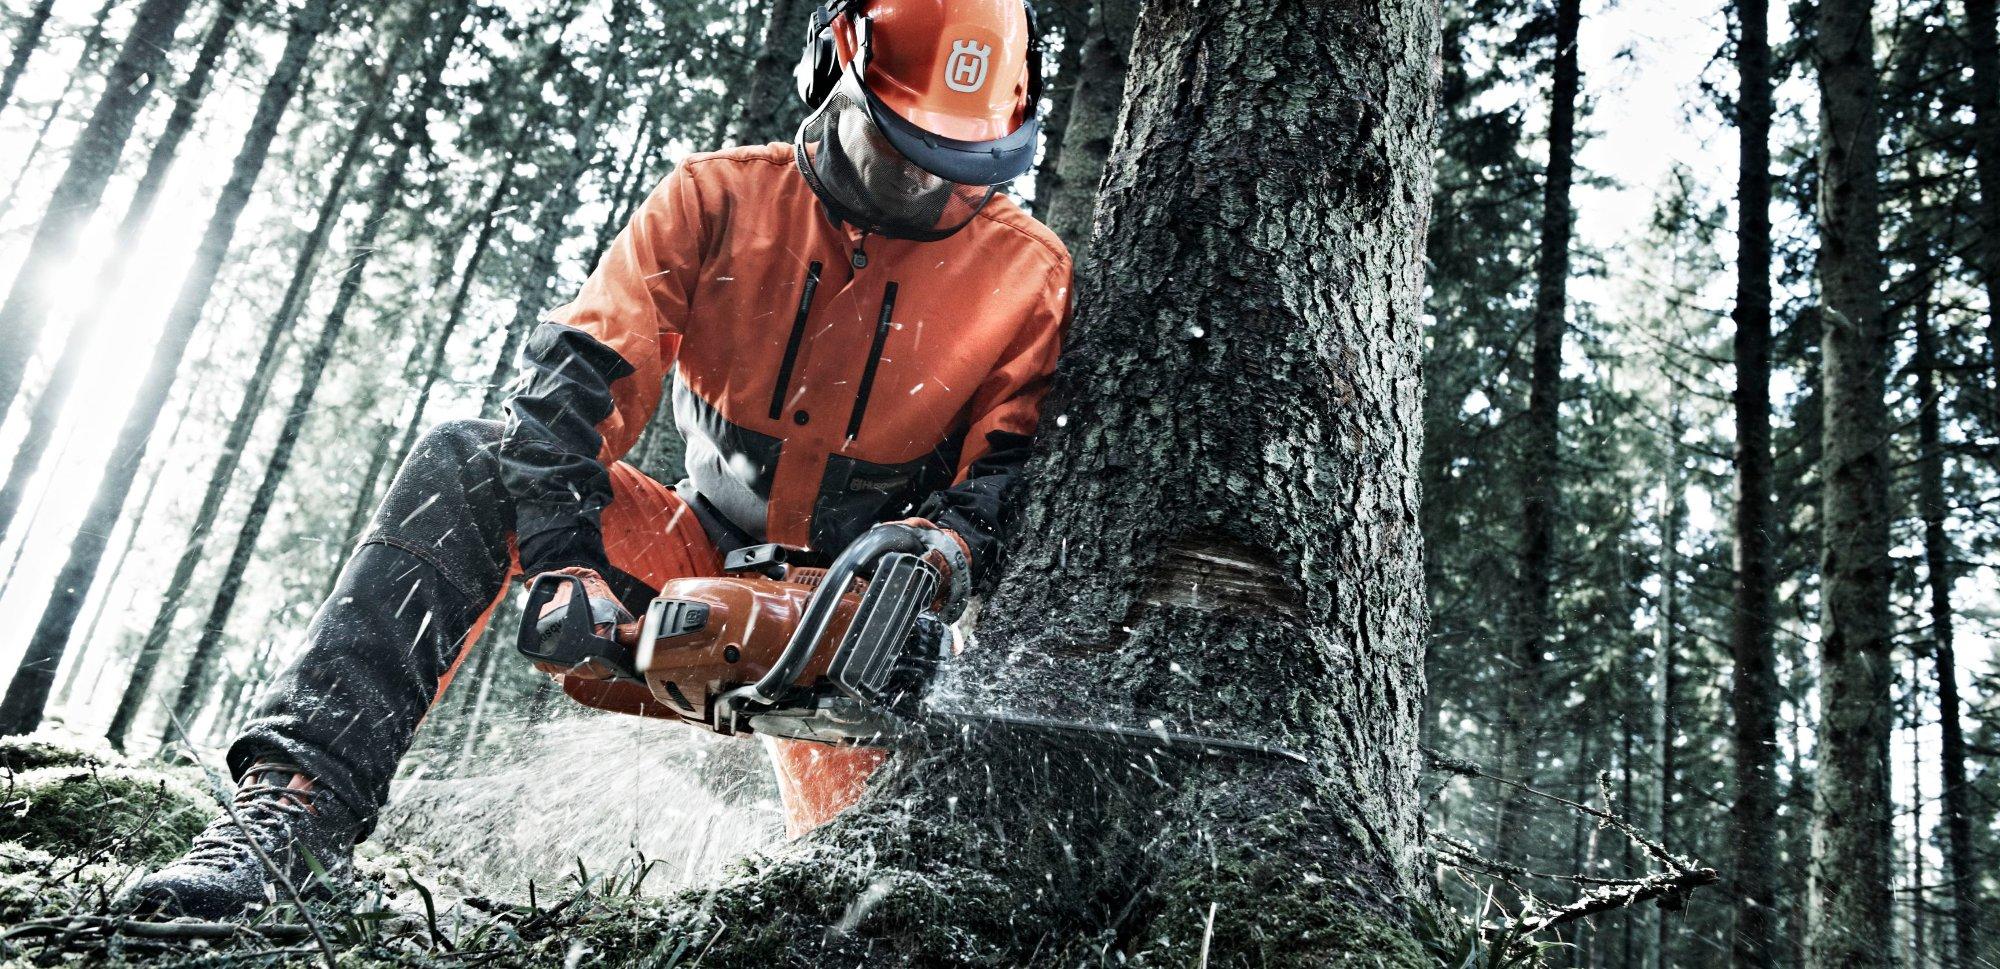 Husqvarna-chainsaw-wood-2